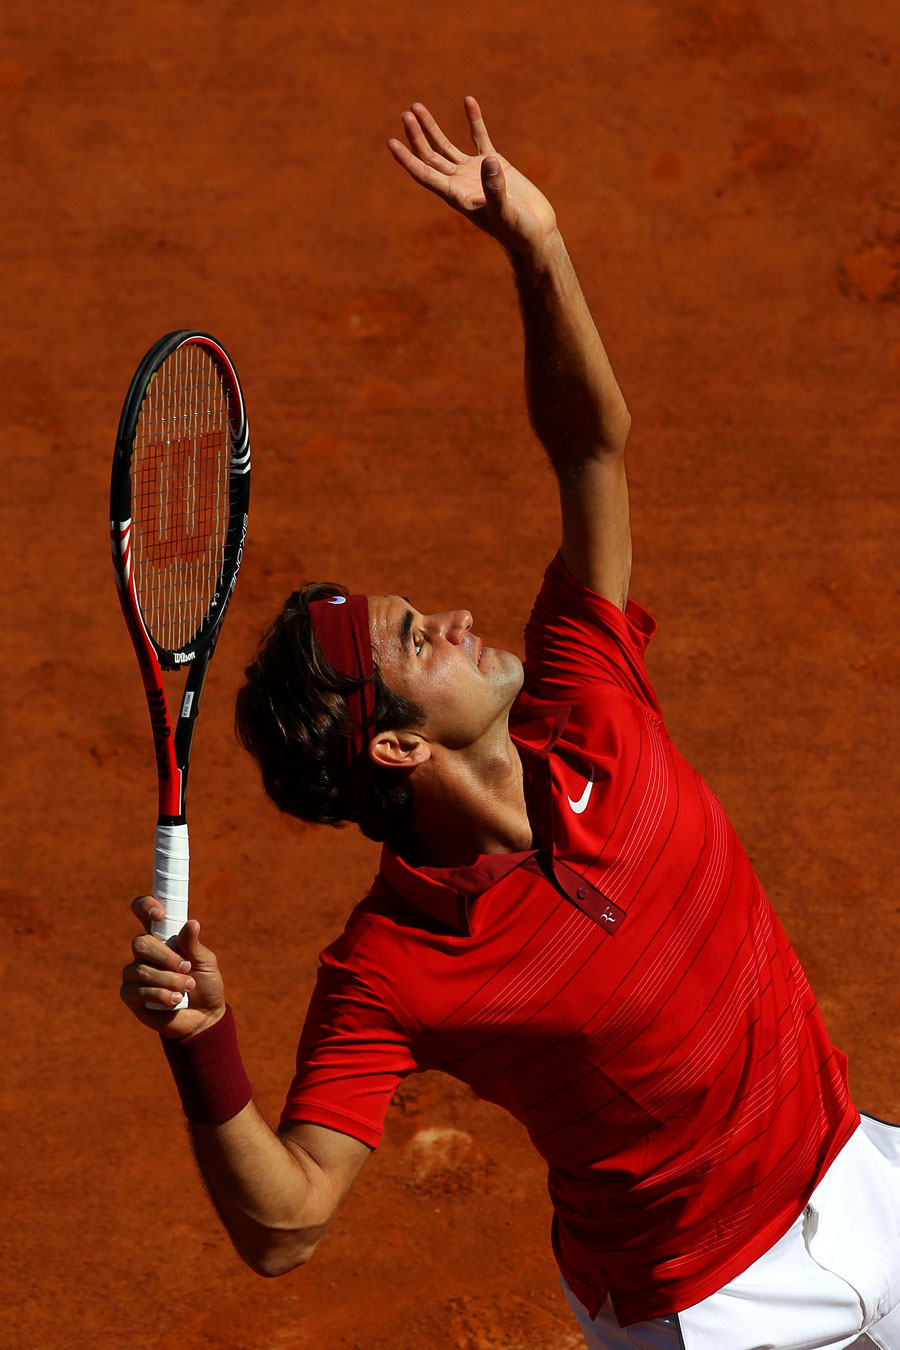 24936 - Roger Federer powers through in Paris